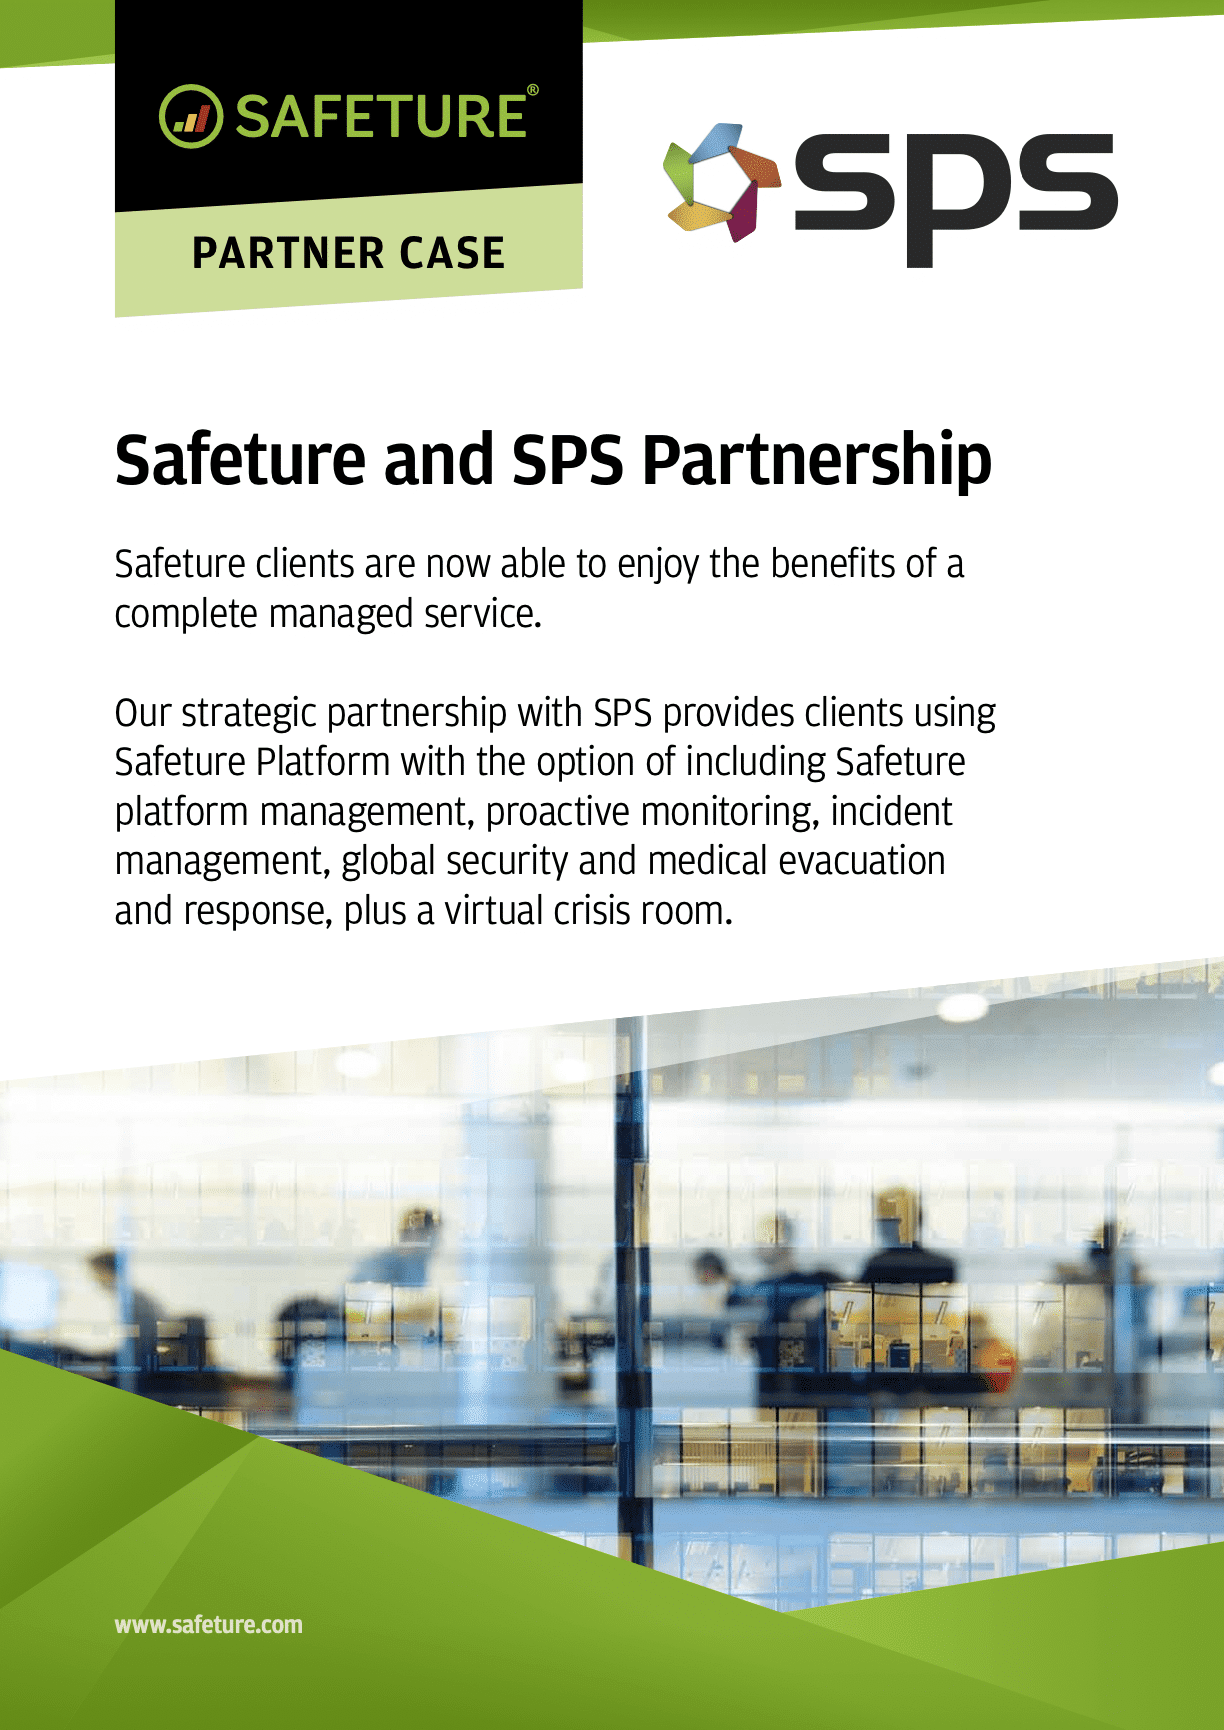 Safeture SPS Partnership